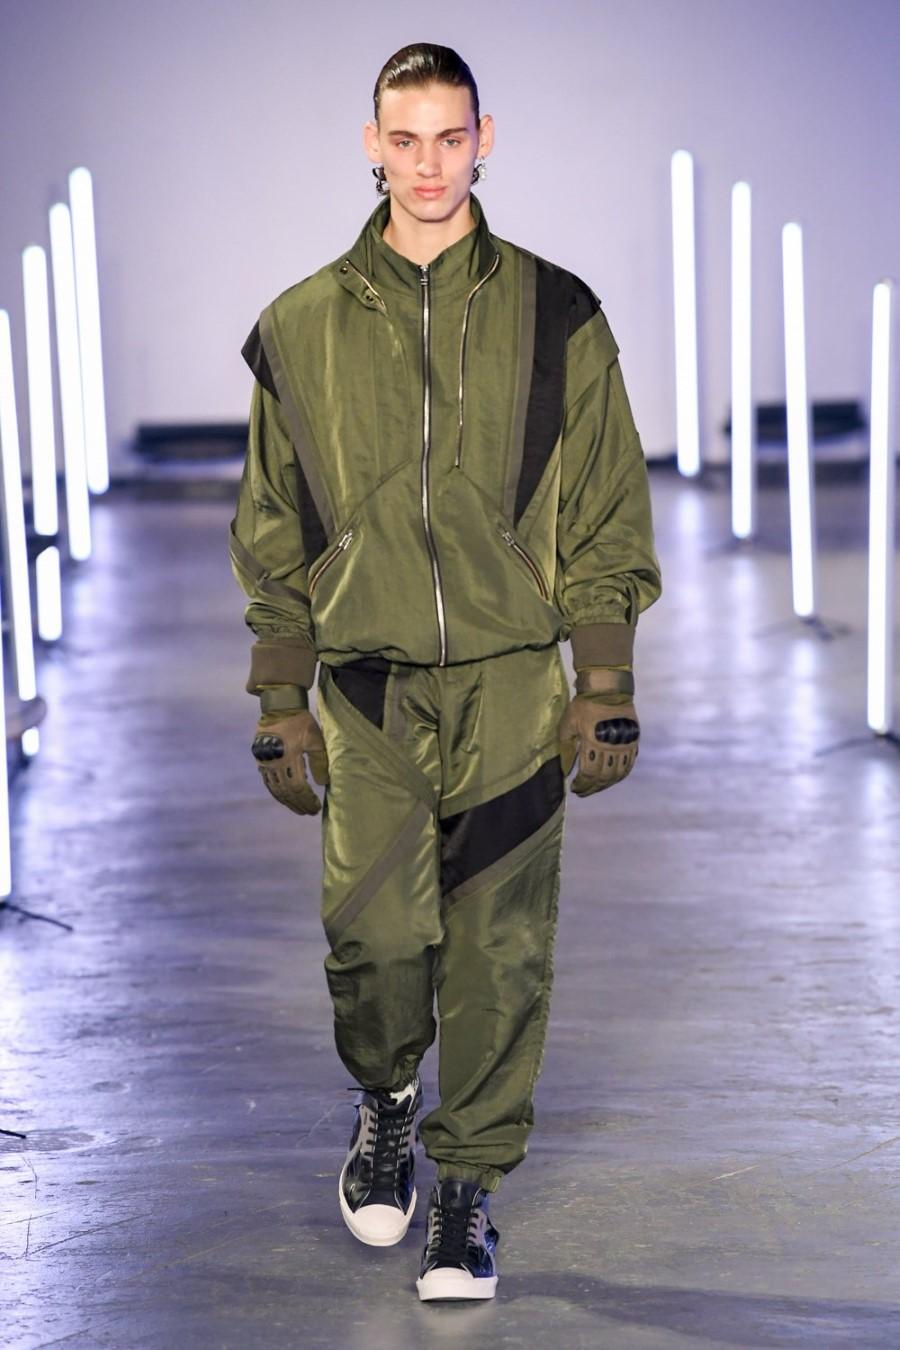 Feng Chen Wang - Automne-Hiver 2020-2021 - London Fashion Week Men's